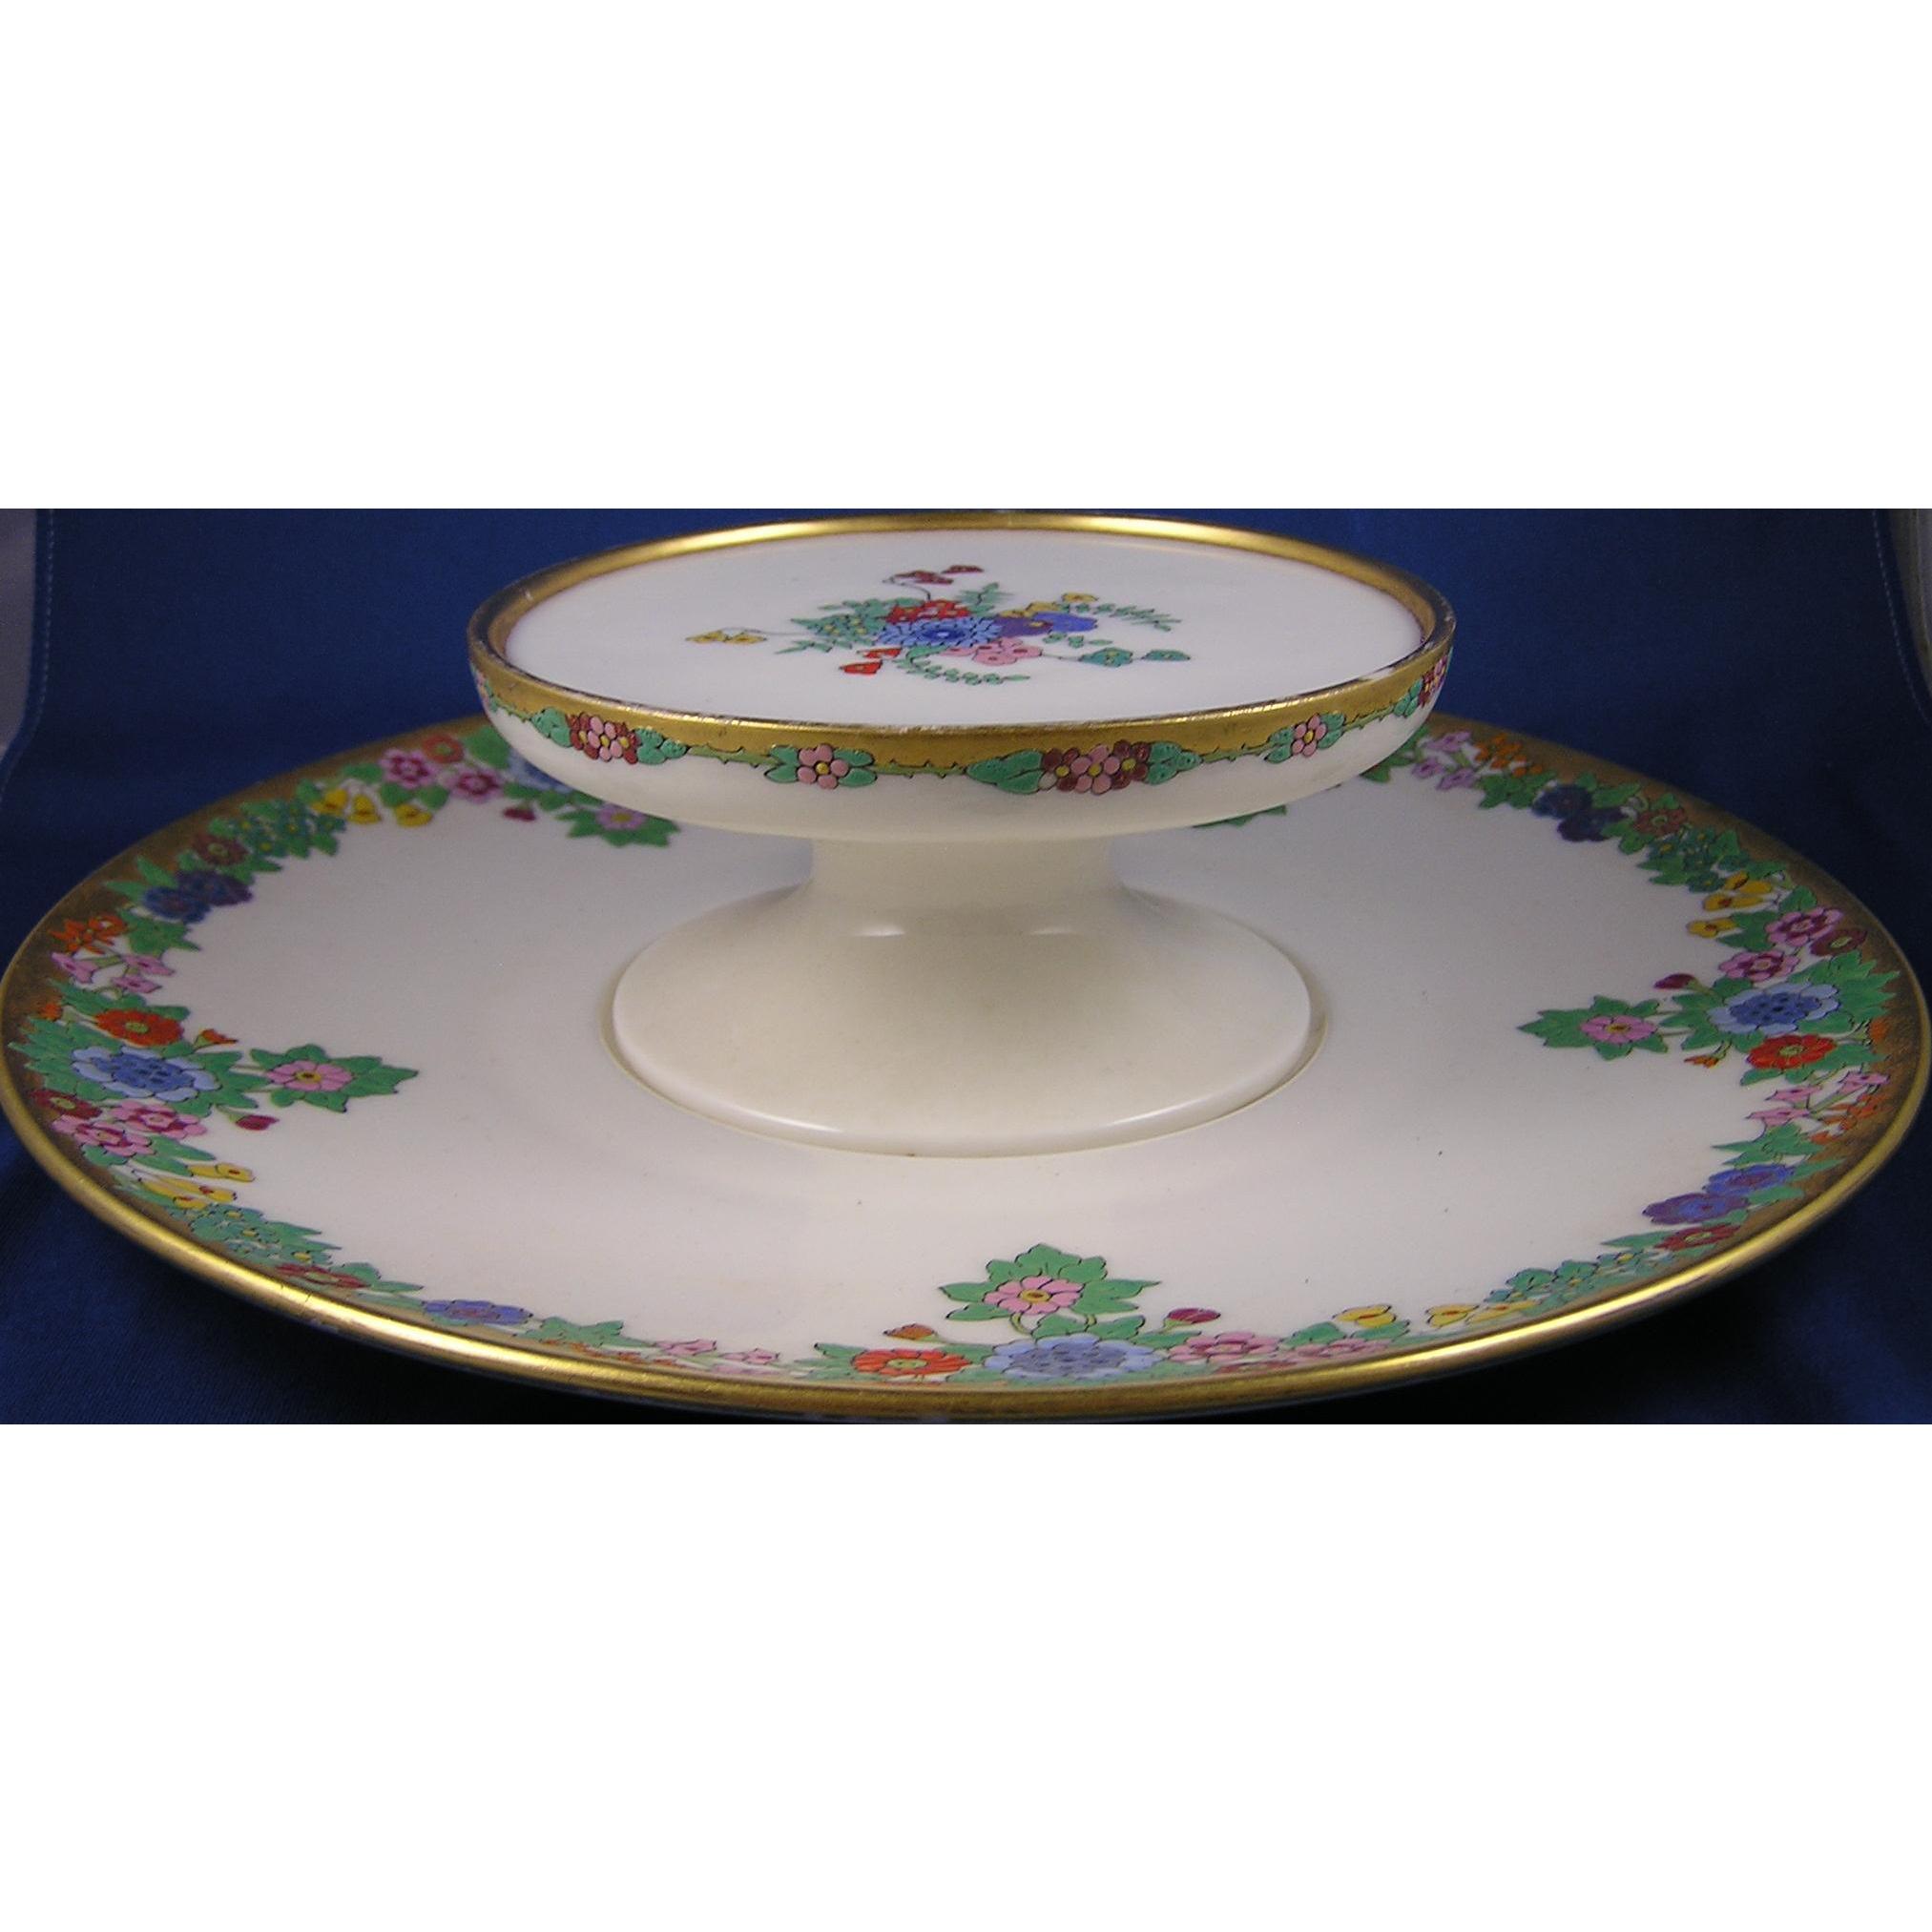 "Lenox Belleek Enameled Floral Design Tiered Caviar Serving Plate/Dish (Signed ""Hazel N. Green""/Dated 1926)"